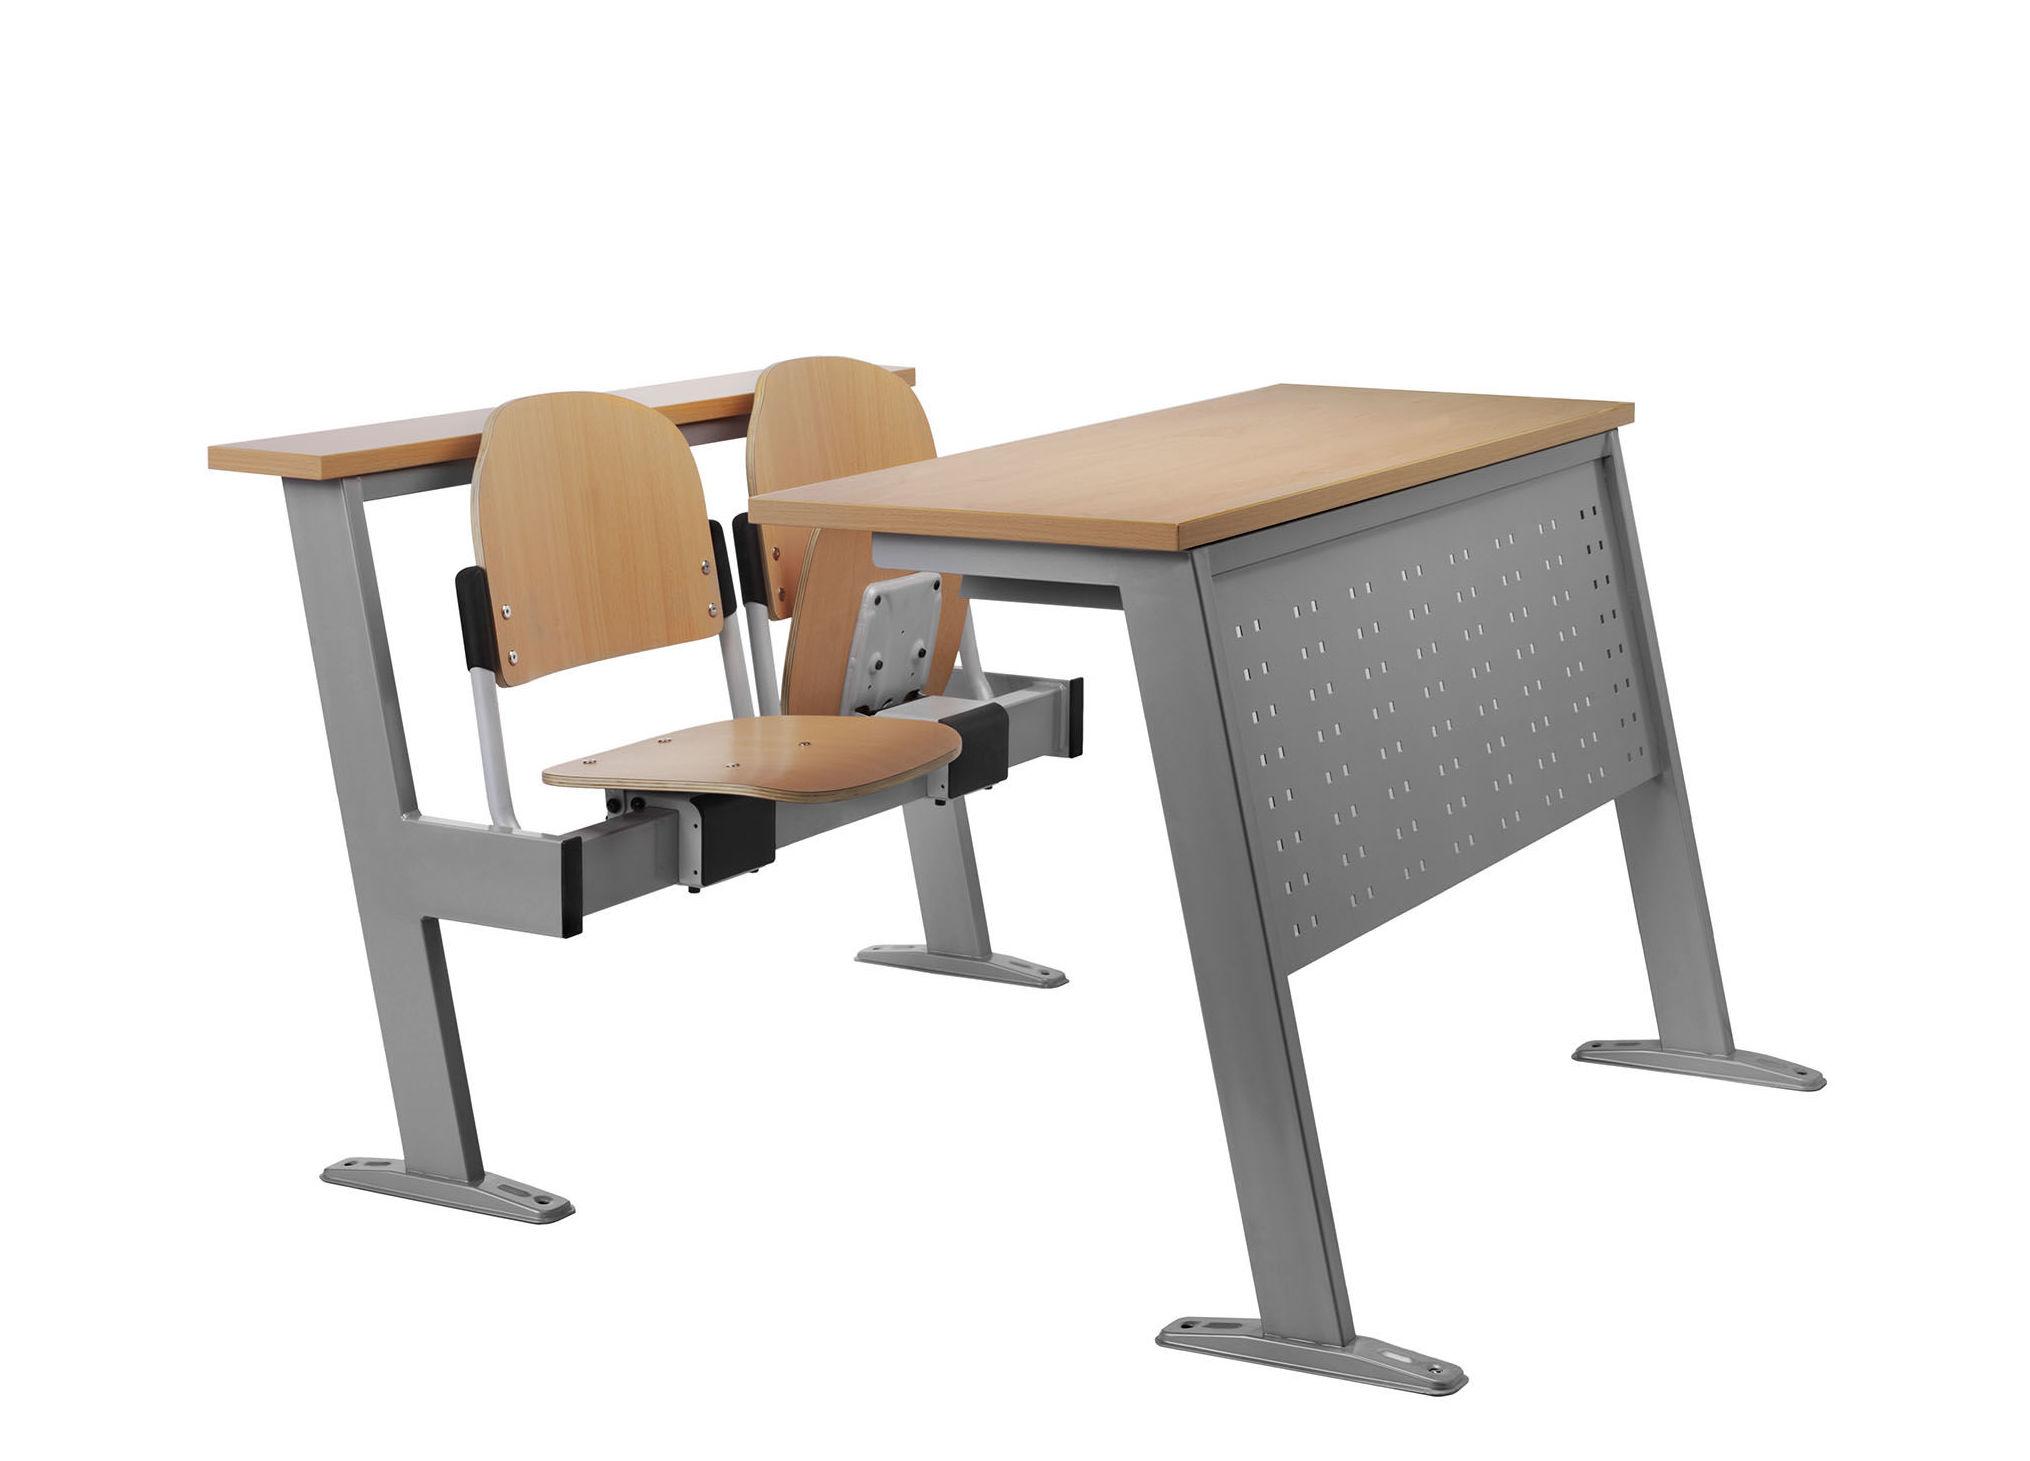 Fabricación mobiliario universitario Salamanca: Catálogo de Marprieh